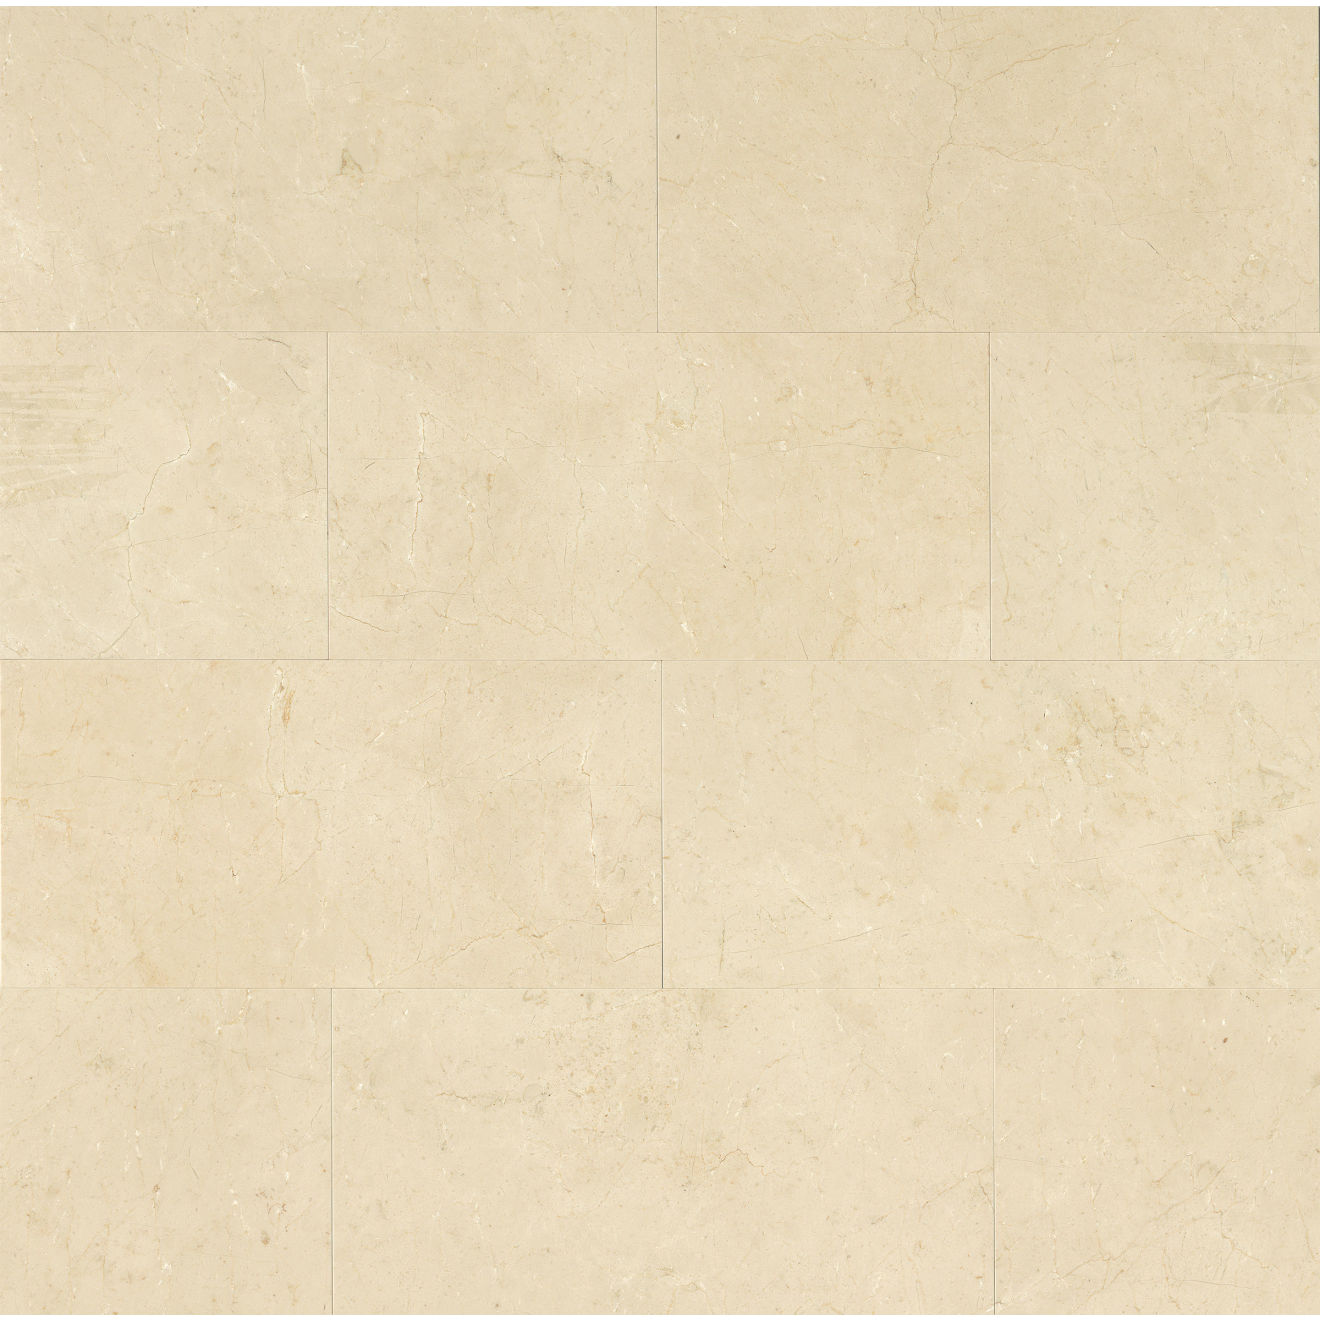 "Crema Marfil Classic 12"" x 24"" Floor & Wall Tile"